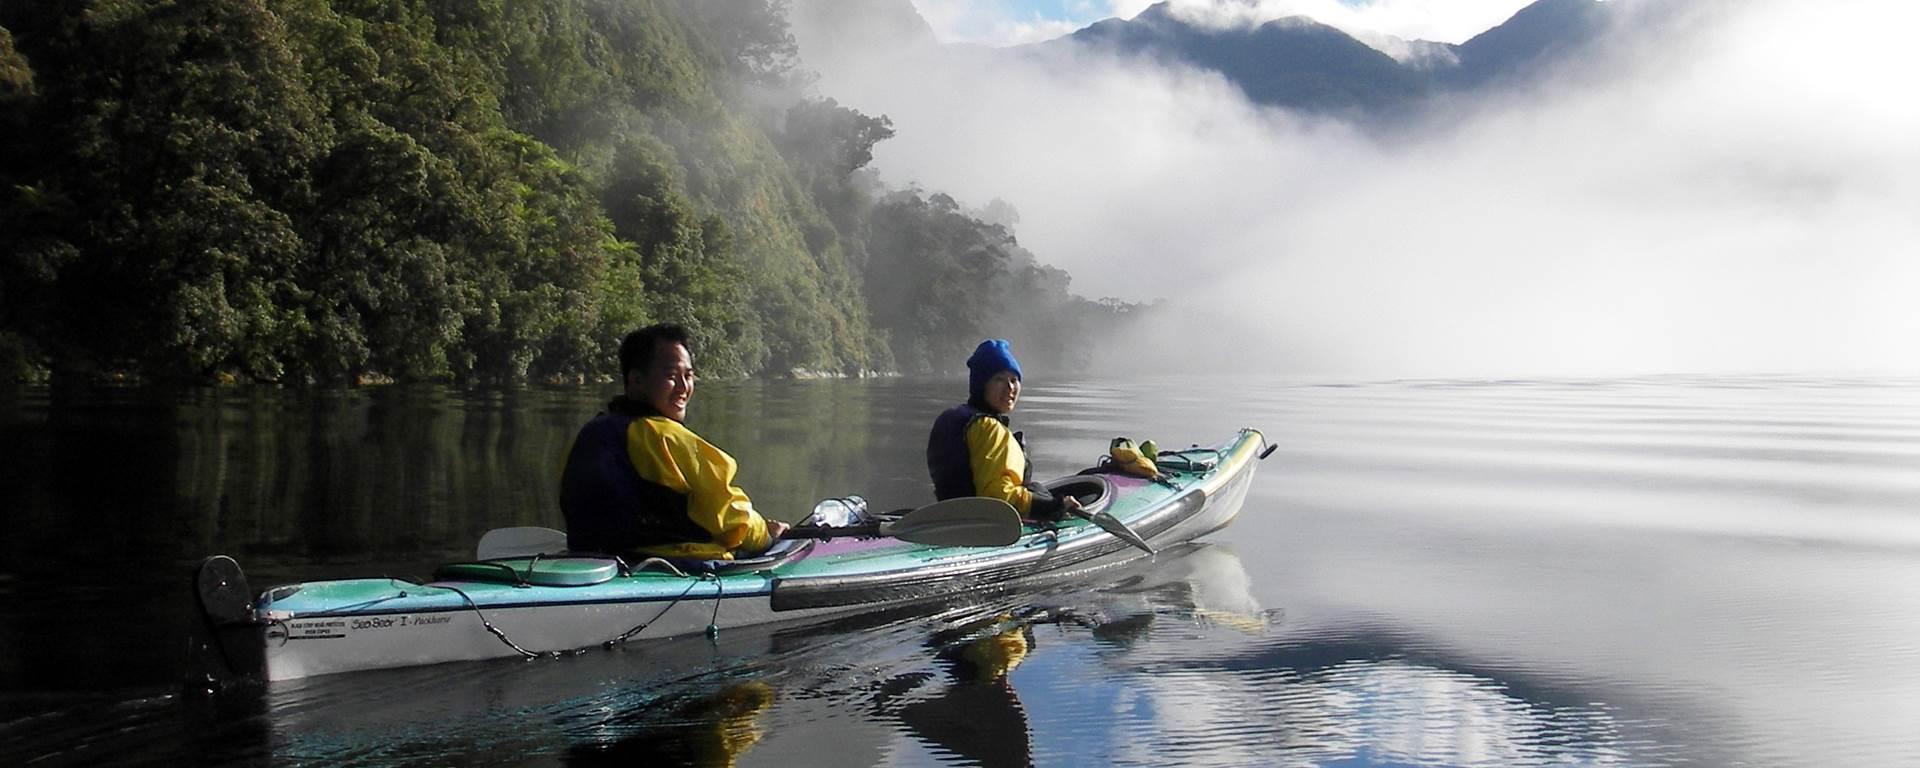 Real Journeys Nz Kayak Doubtful Sound Overnighter Multiday Lion Star Teko Thermo Water Jug 13 L K 1 Sea Kayaking